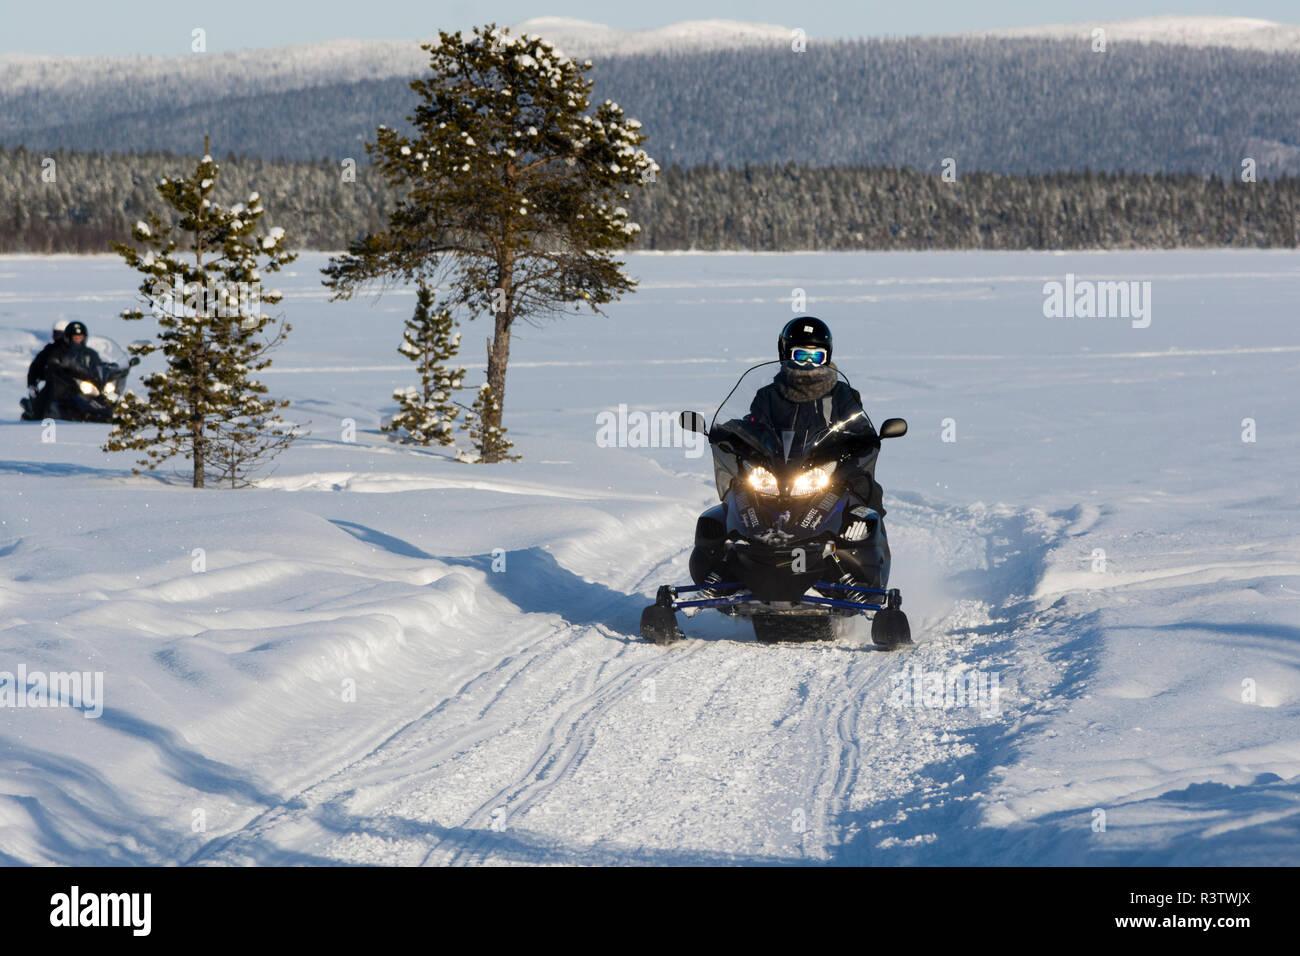 Snowmobile, Jukkasjarvi, Sweden. - Stock Image